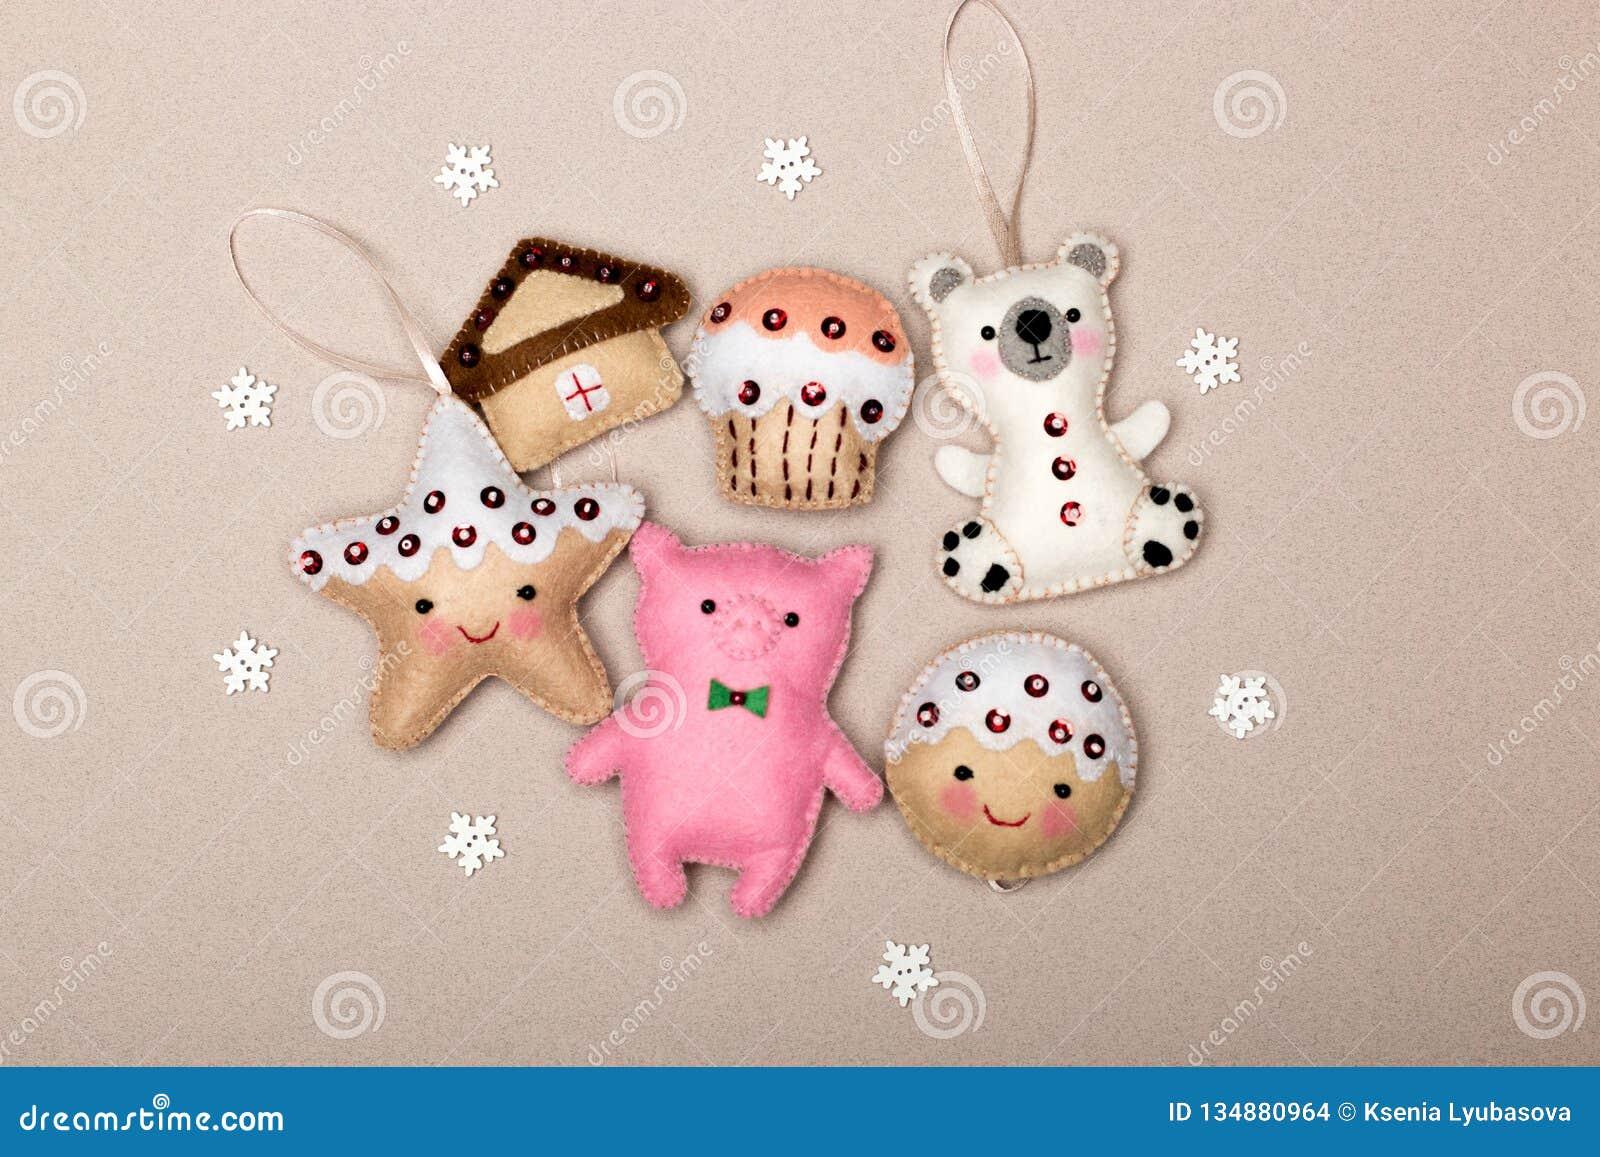 Set of six Christmas decorations handmade felt